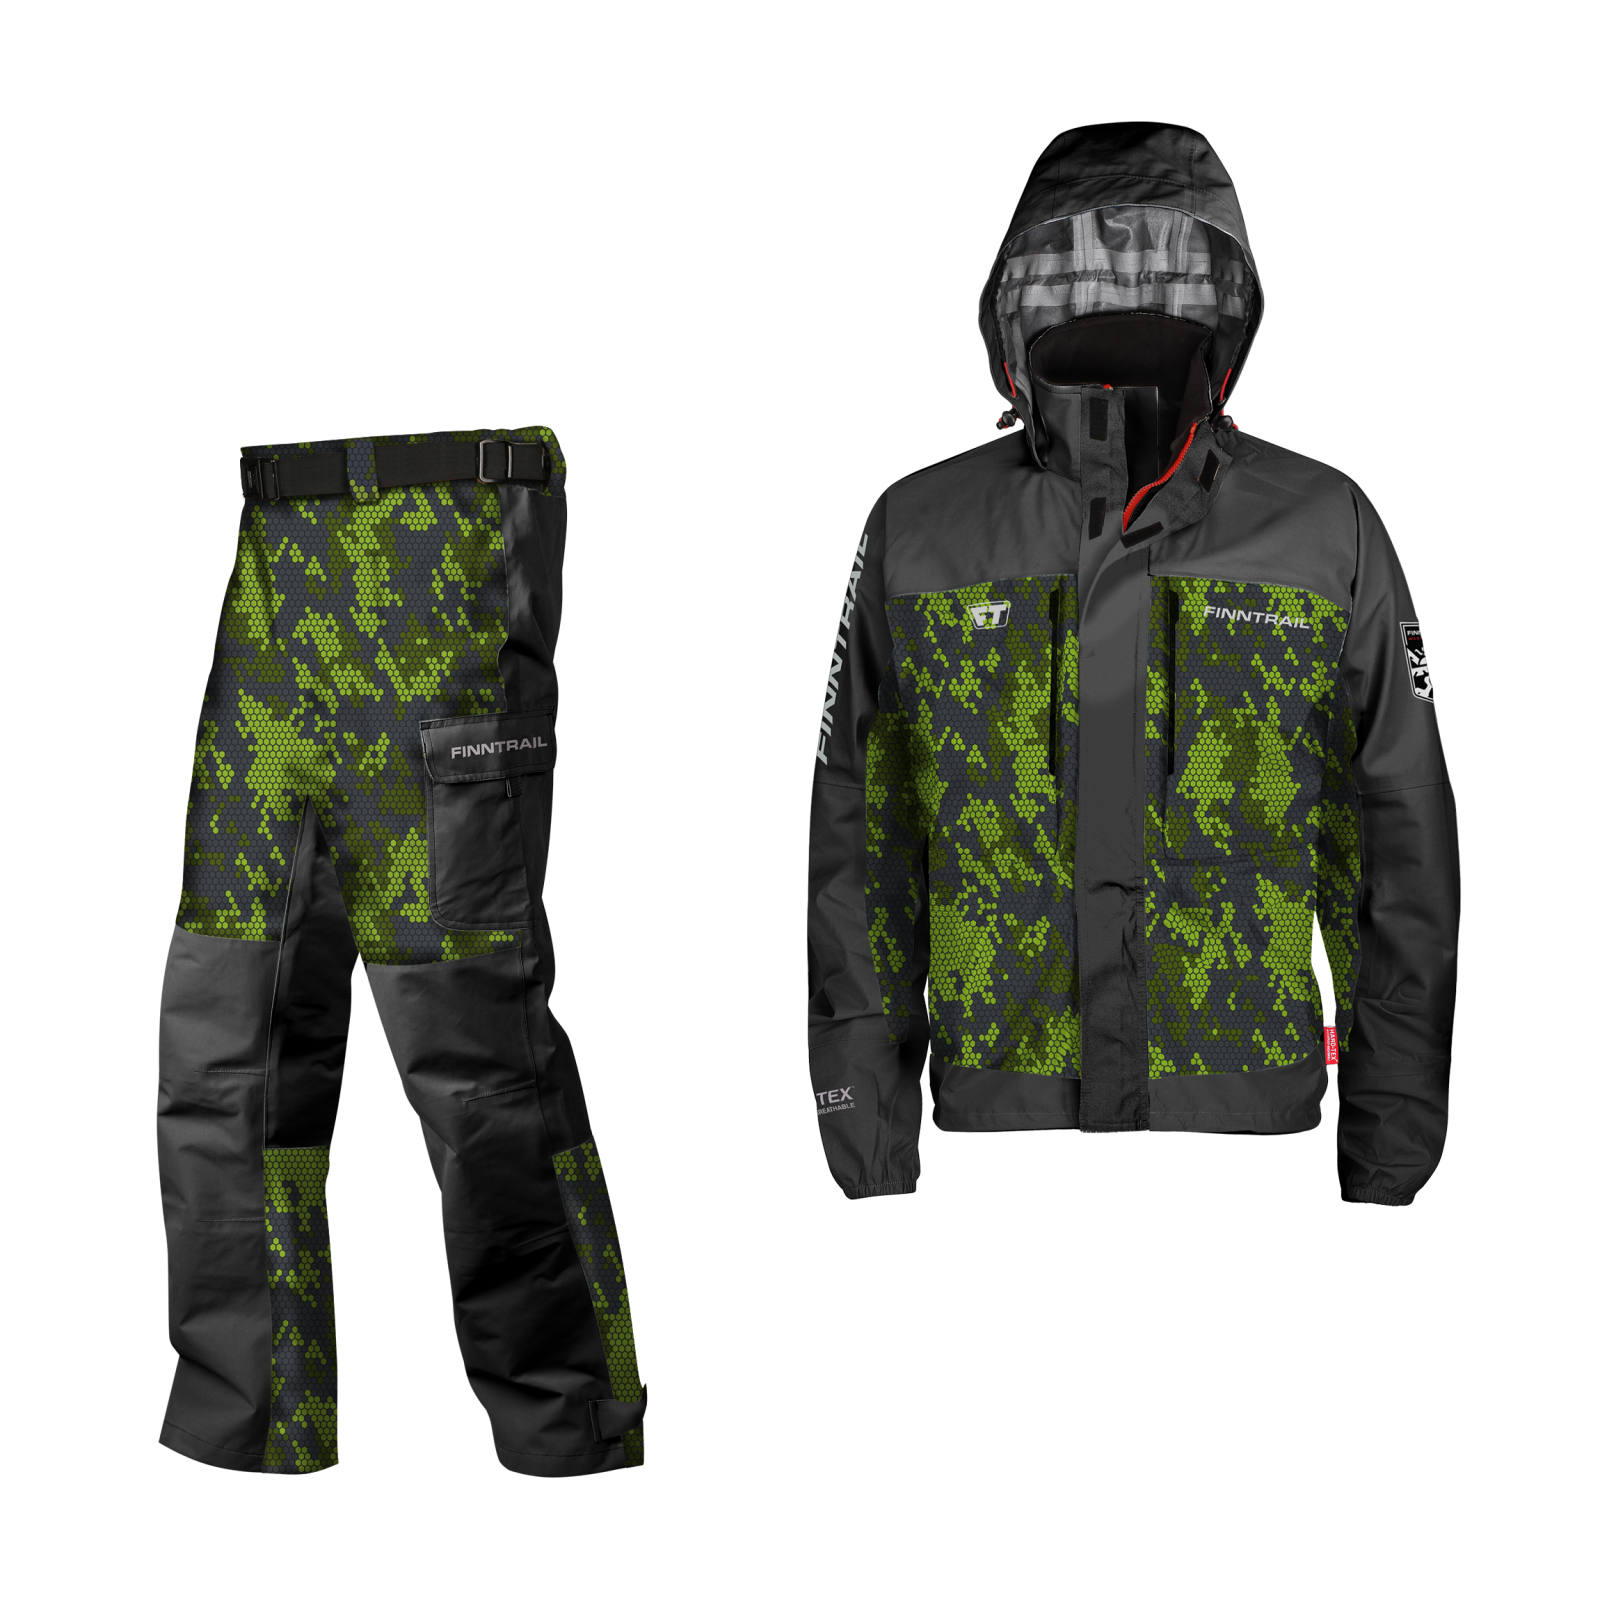 Finntrail Suit Shooter CamoGreen